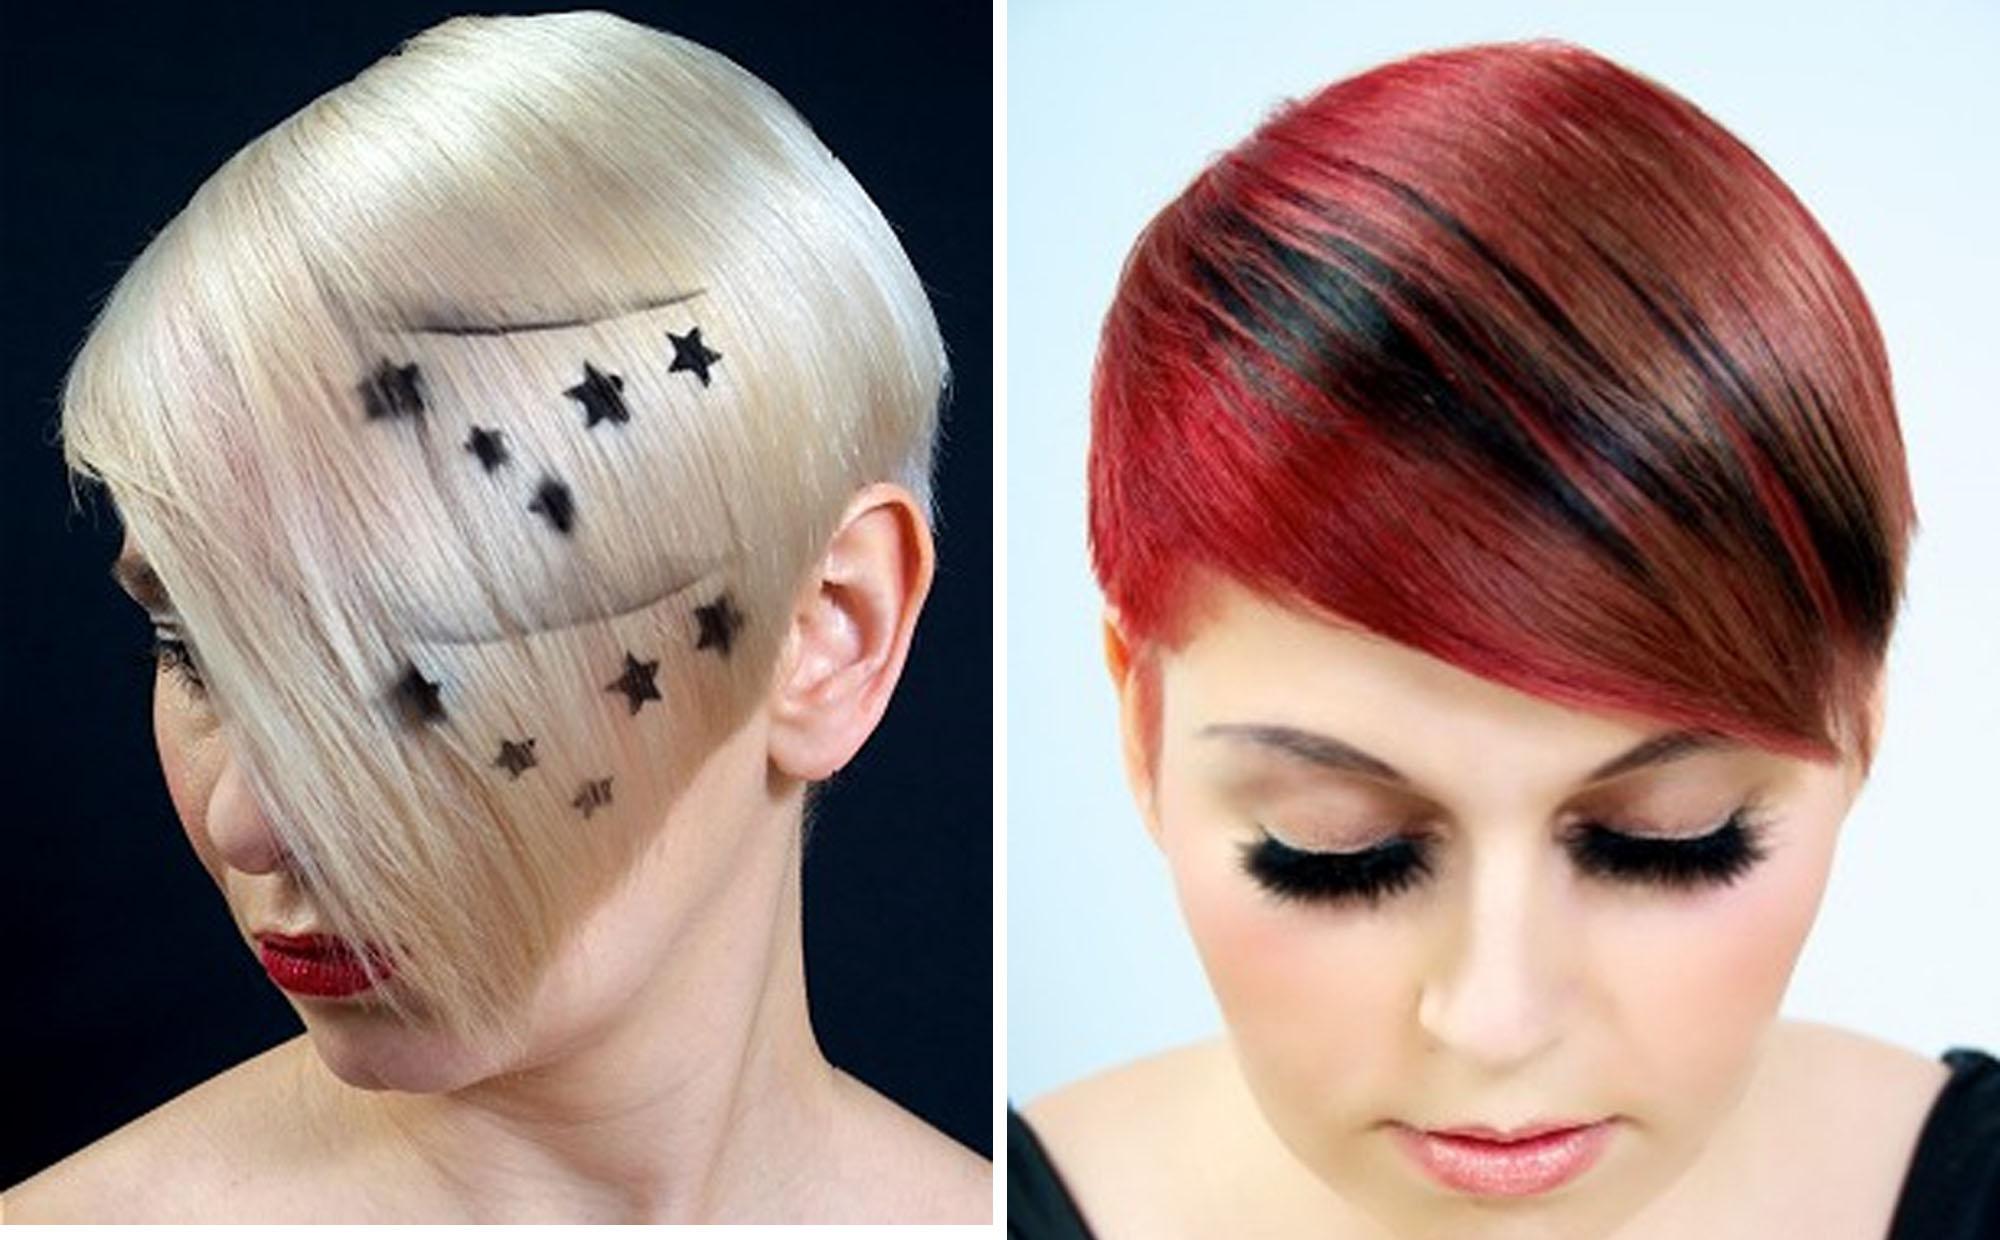 Hair Designs For Short Hair | The Holle In Short Hair Cut Designs (View 14 of 25)